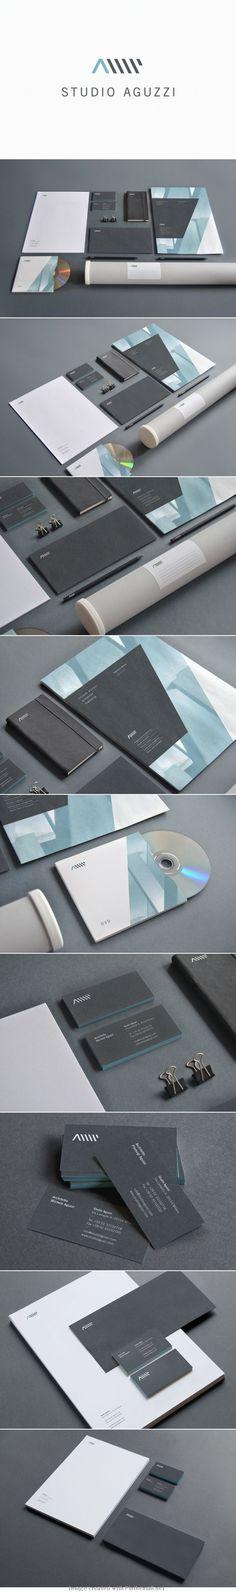 branding — Designspiration